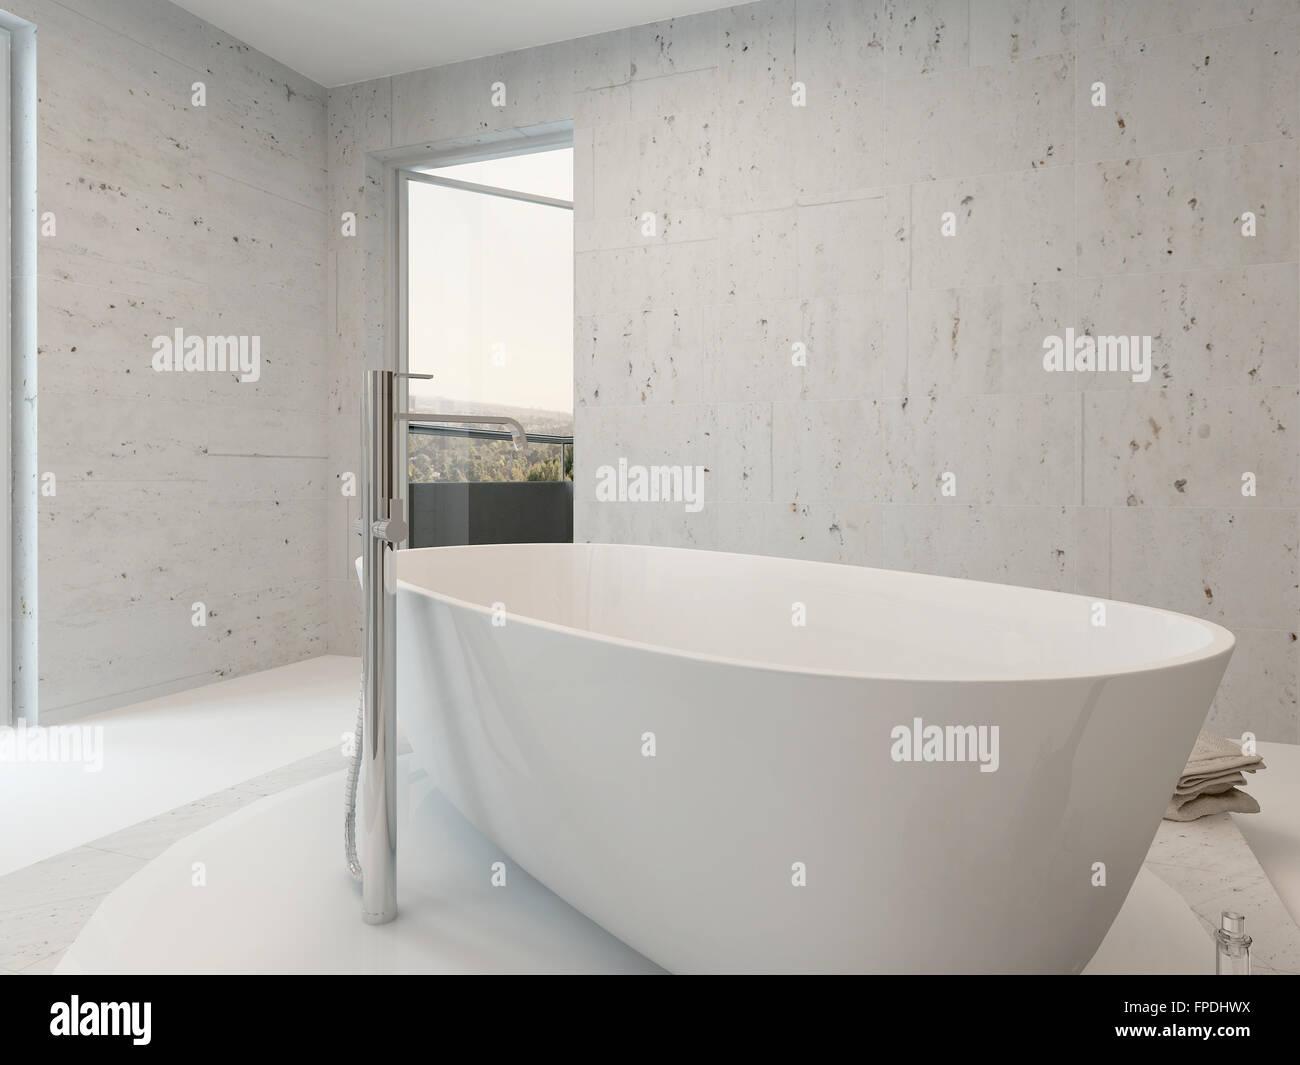 Jacuzzi Whirlpool Bathtub Rendering Lifestyle Stock Photos & Jacuzzi ...